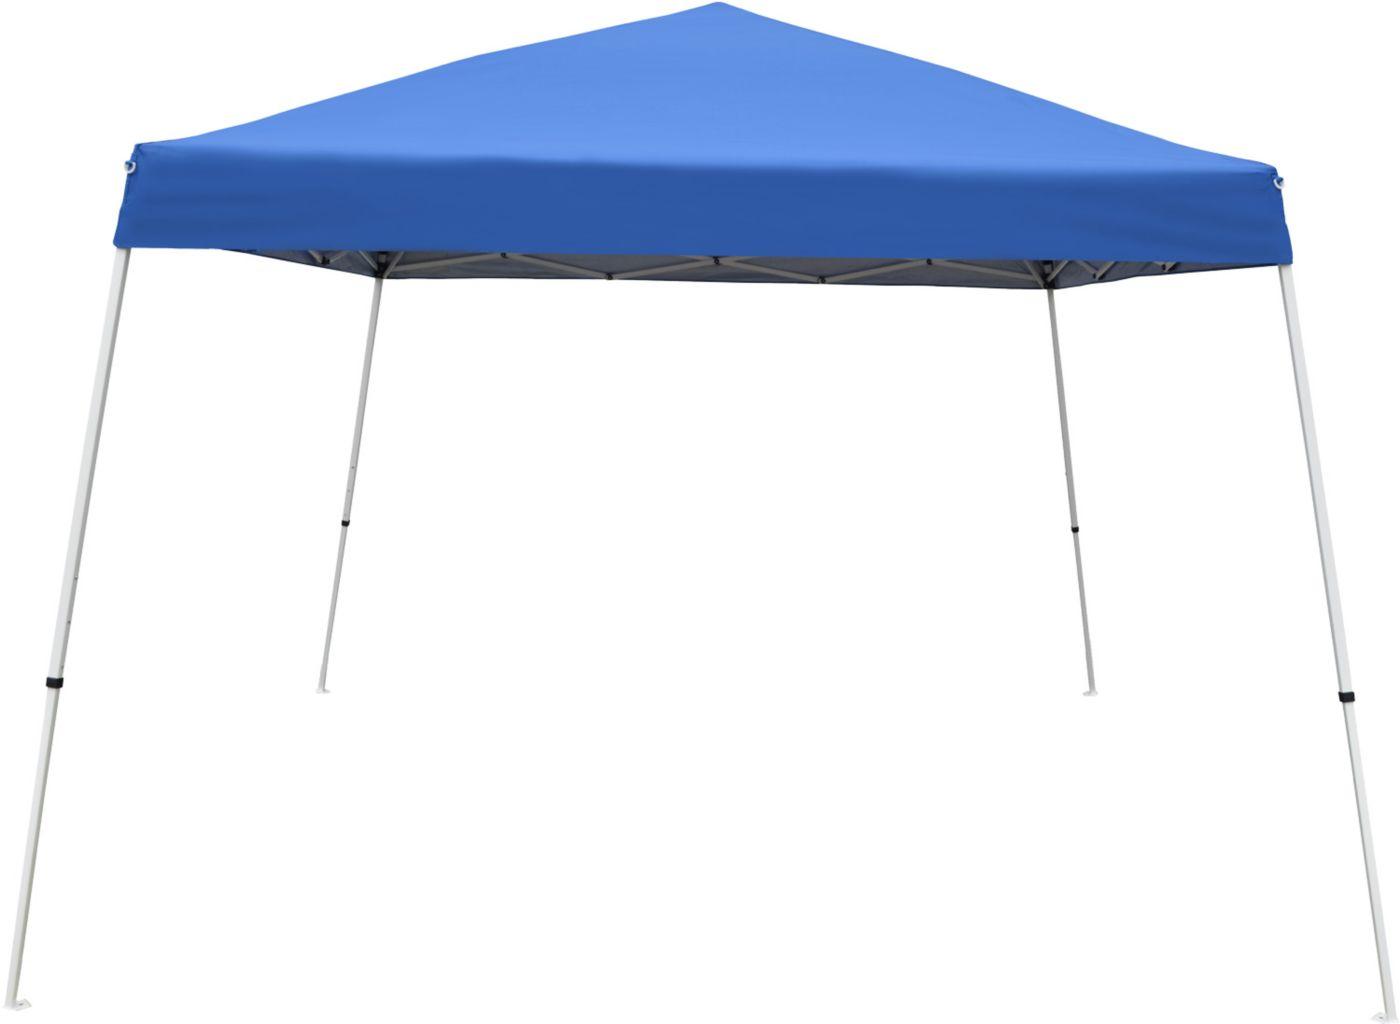 Caravan Canopy V-Series 2 12' x 12' Slant Leg Canopy